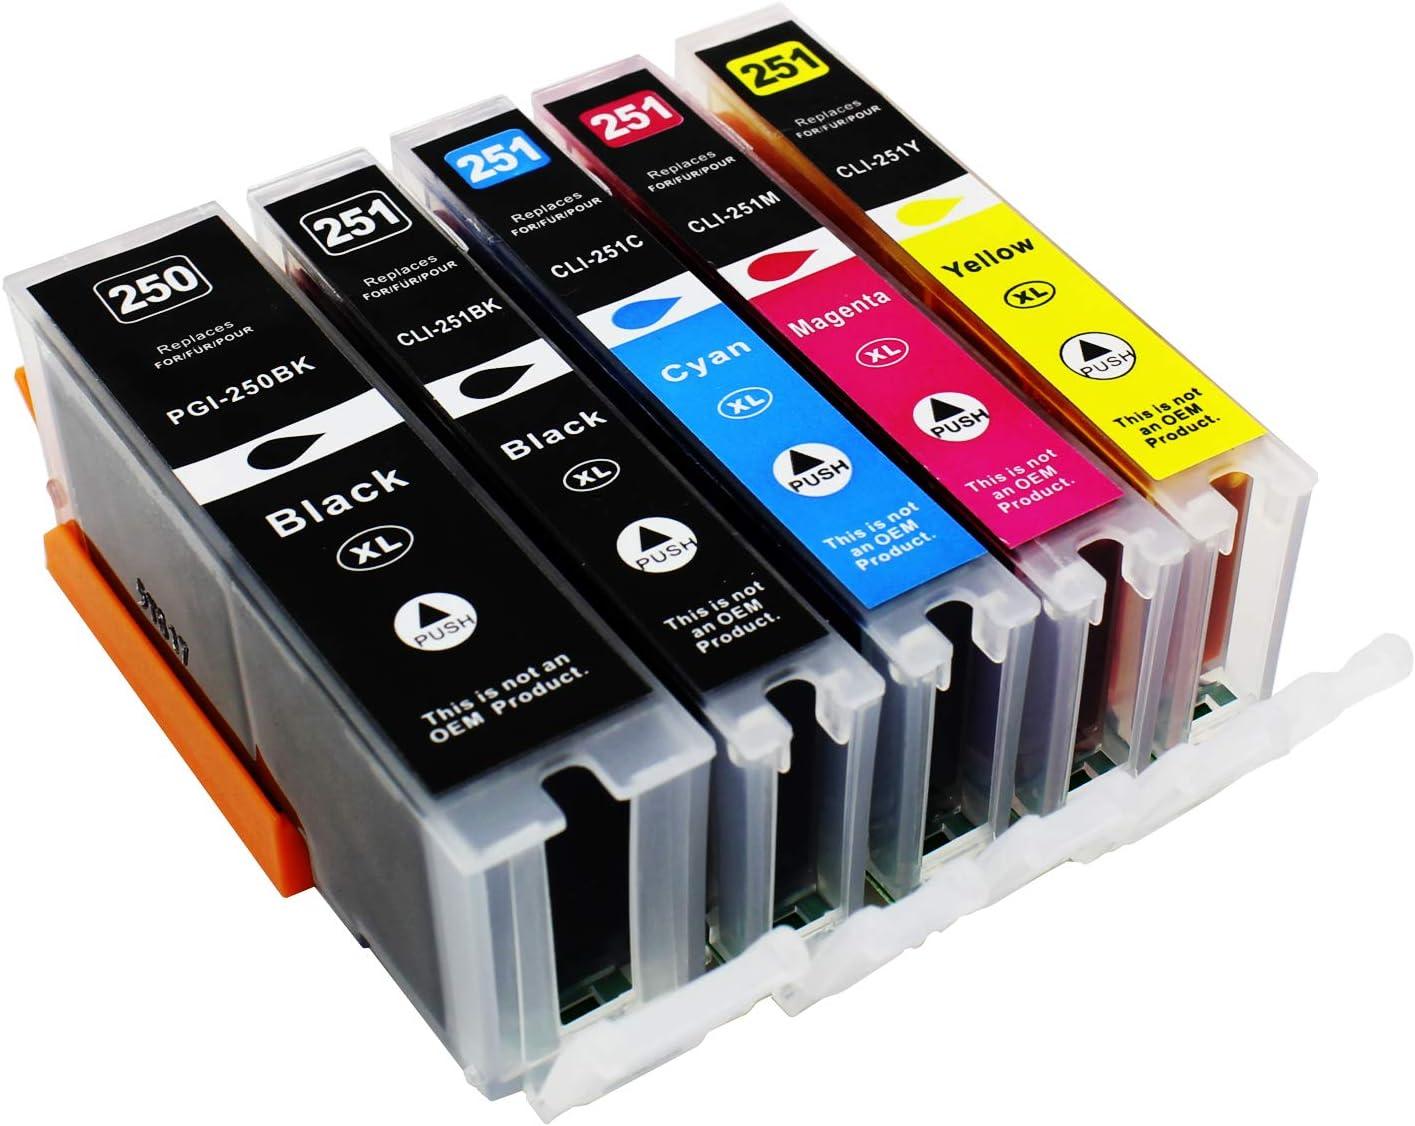 5 Pack PGI-250 & CLI251 compatible ink cartridge replacement For Cannon PIXMA MG5420, PIXMA MG5450, PIXMA MG6320, PIXMA MG6350, PIXMA MX722, PIXMA MX922, PIXMA iP7220, PIXMA iP7250 Printers (LB/SB/C/M/Y) @INKTONER